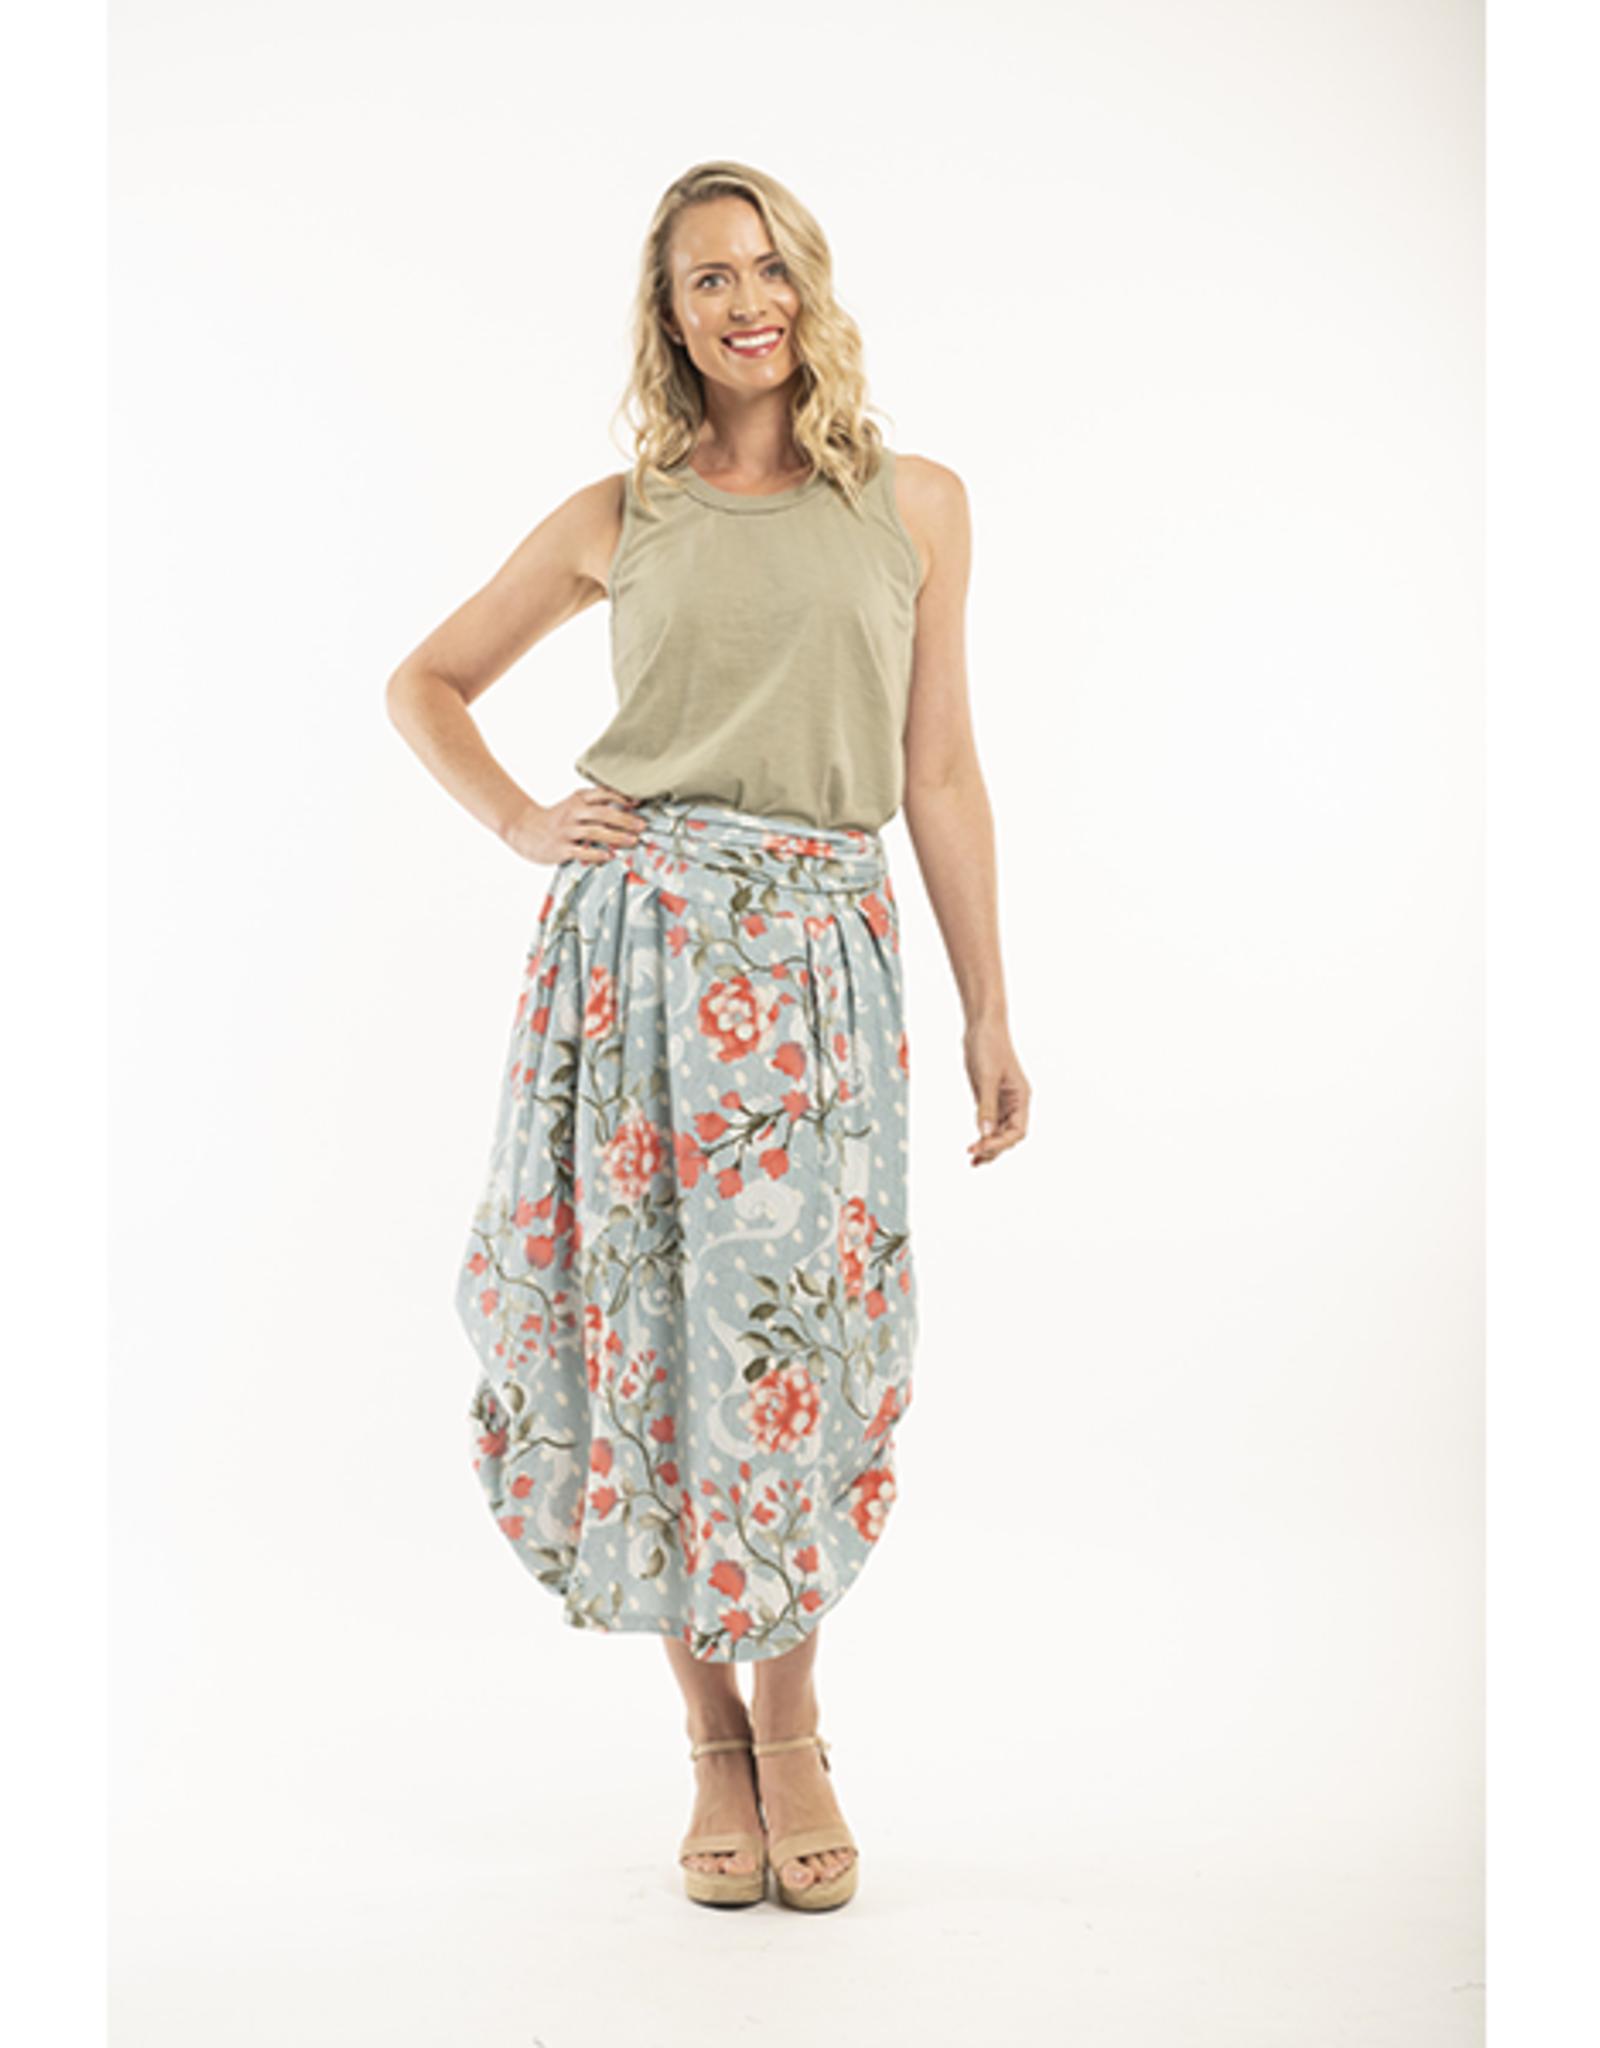 Orientique Hydra Bubble Skirt